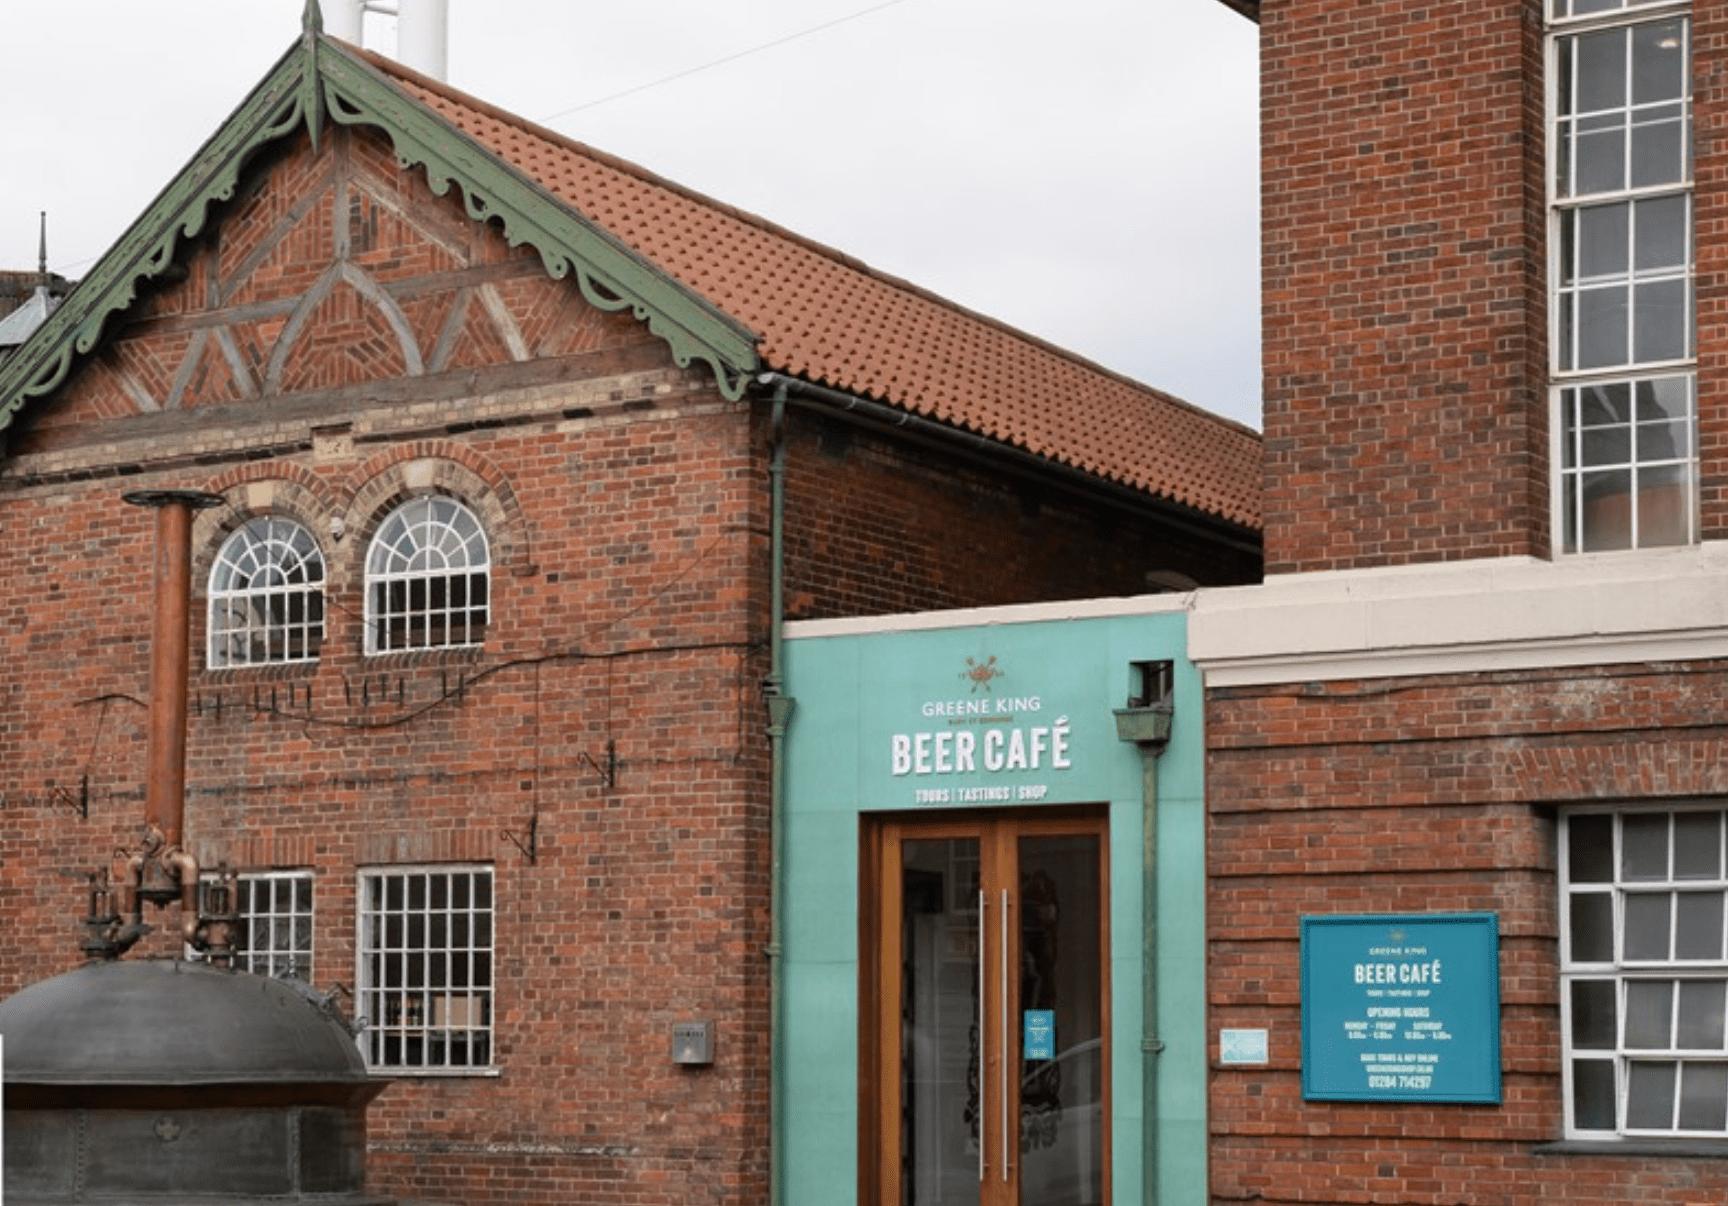 Greene King Brewery in Bury St Edmunds